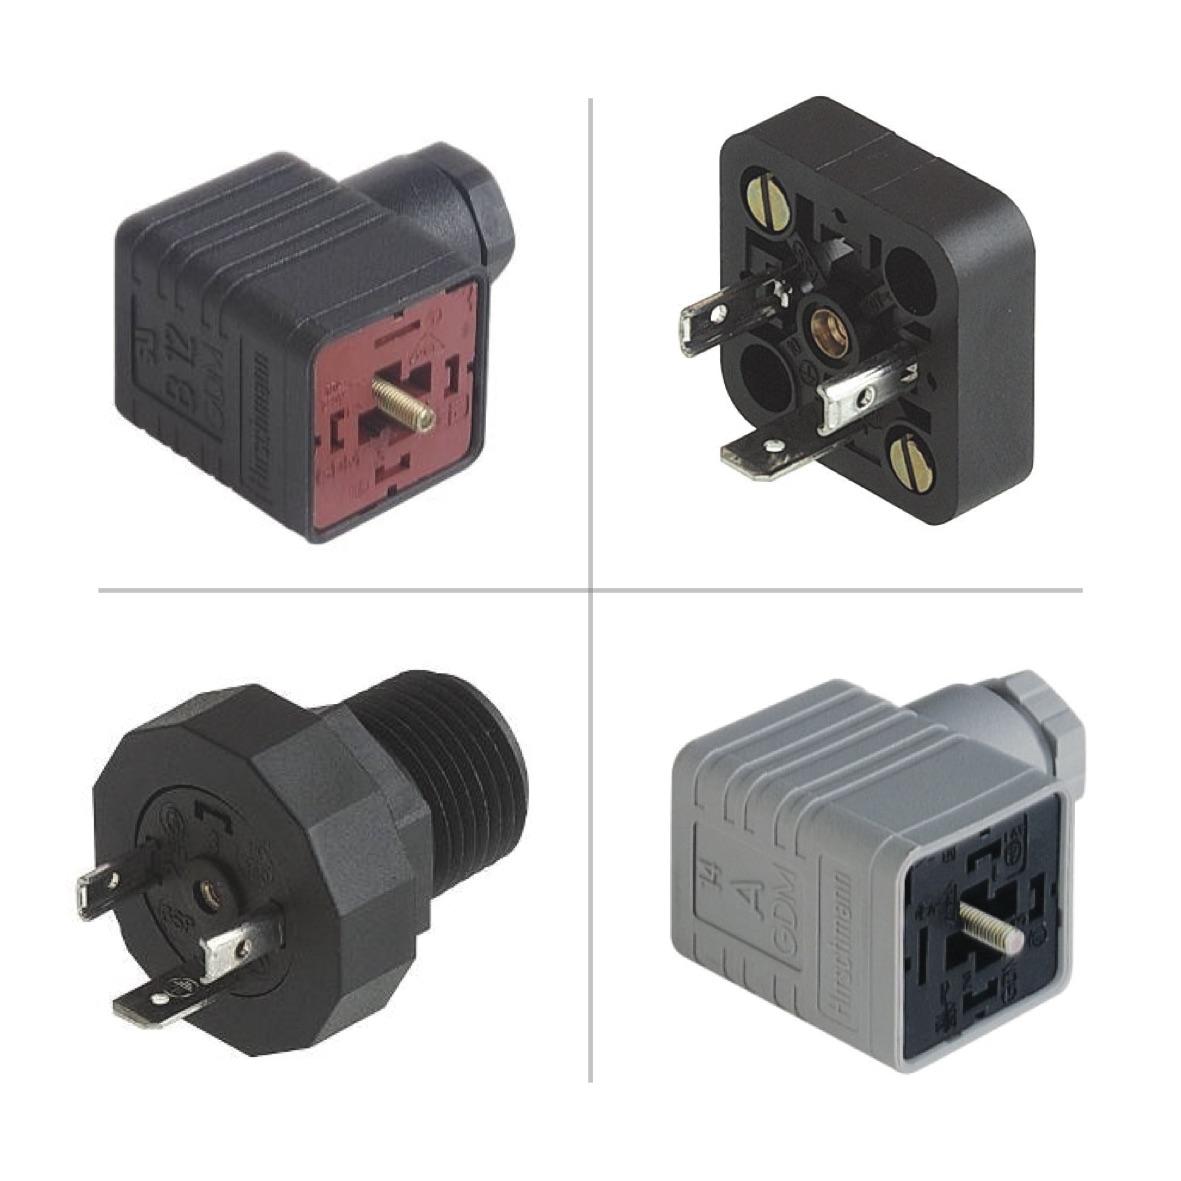 Hirschmann GDM Valve Connectors (DIN 43650)